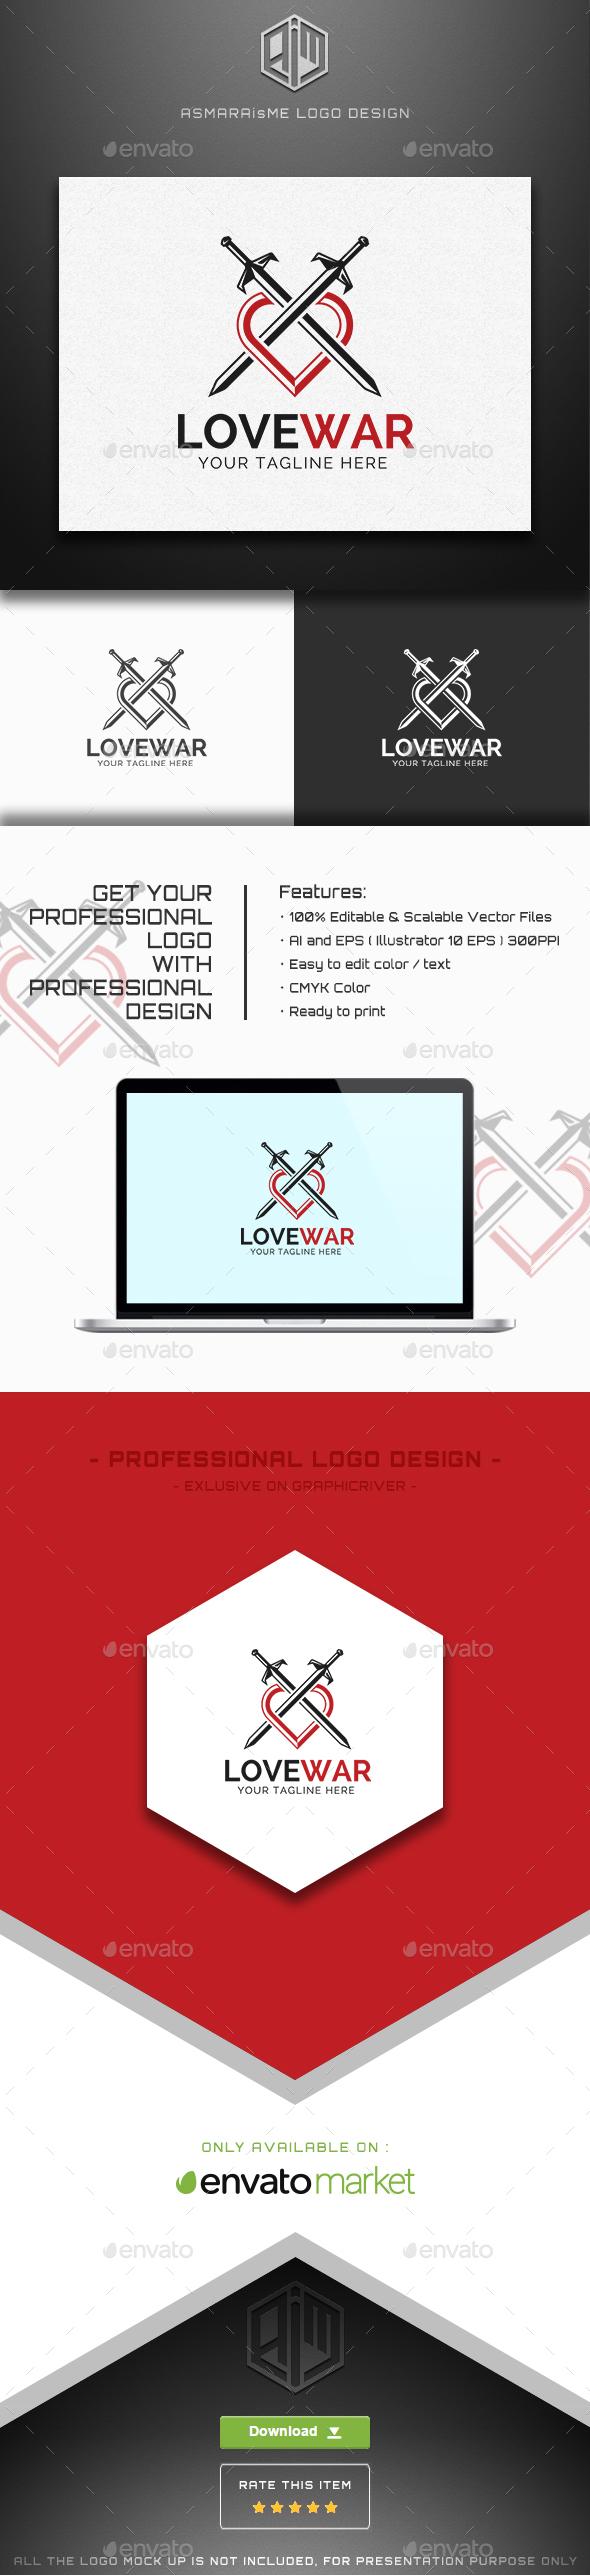 Love War / Love Warior Logo - Abstract Logo Templates